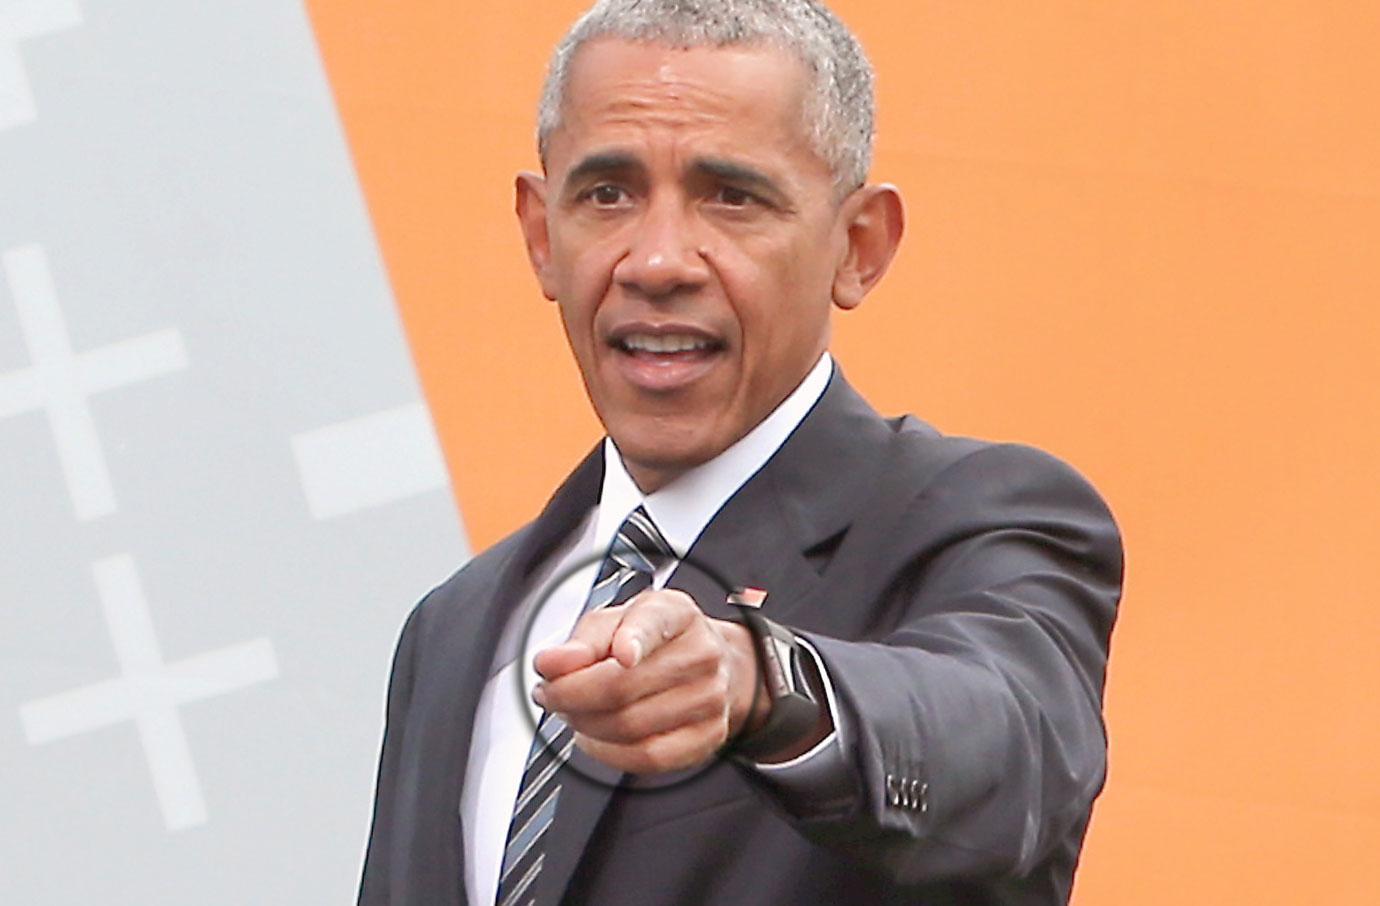 barack obama solo trip michelle obama missing no wedding ring